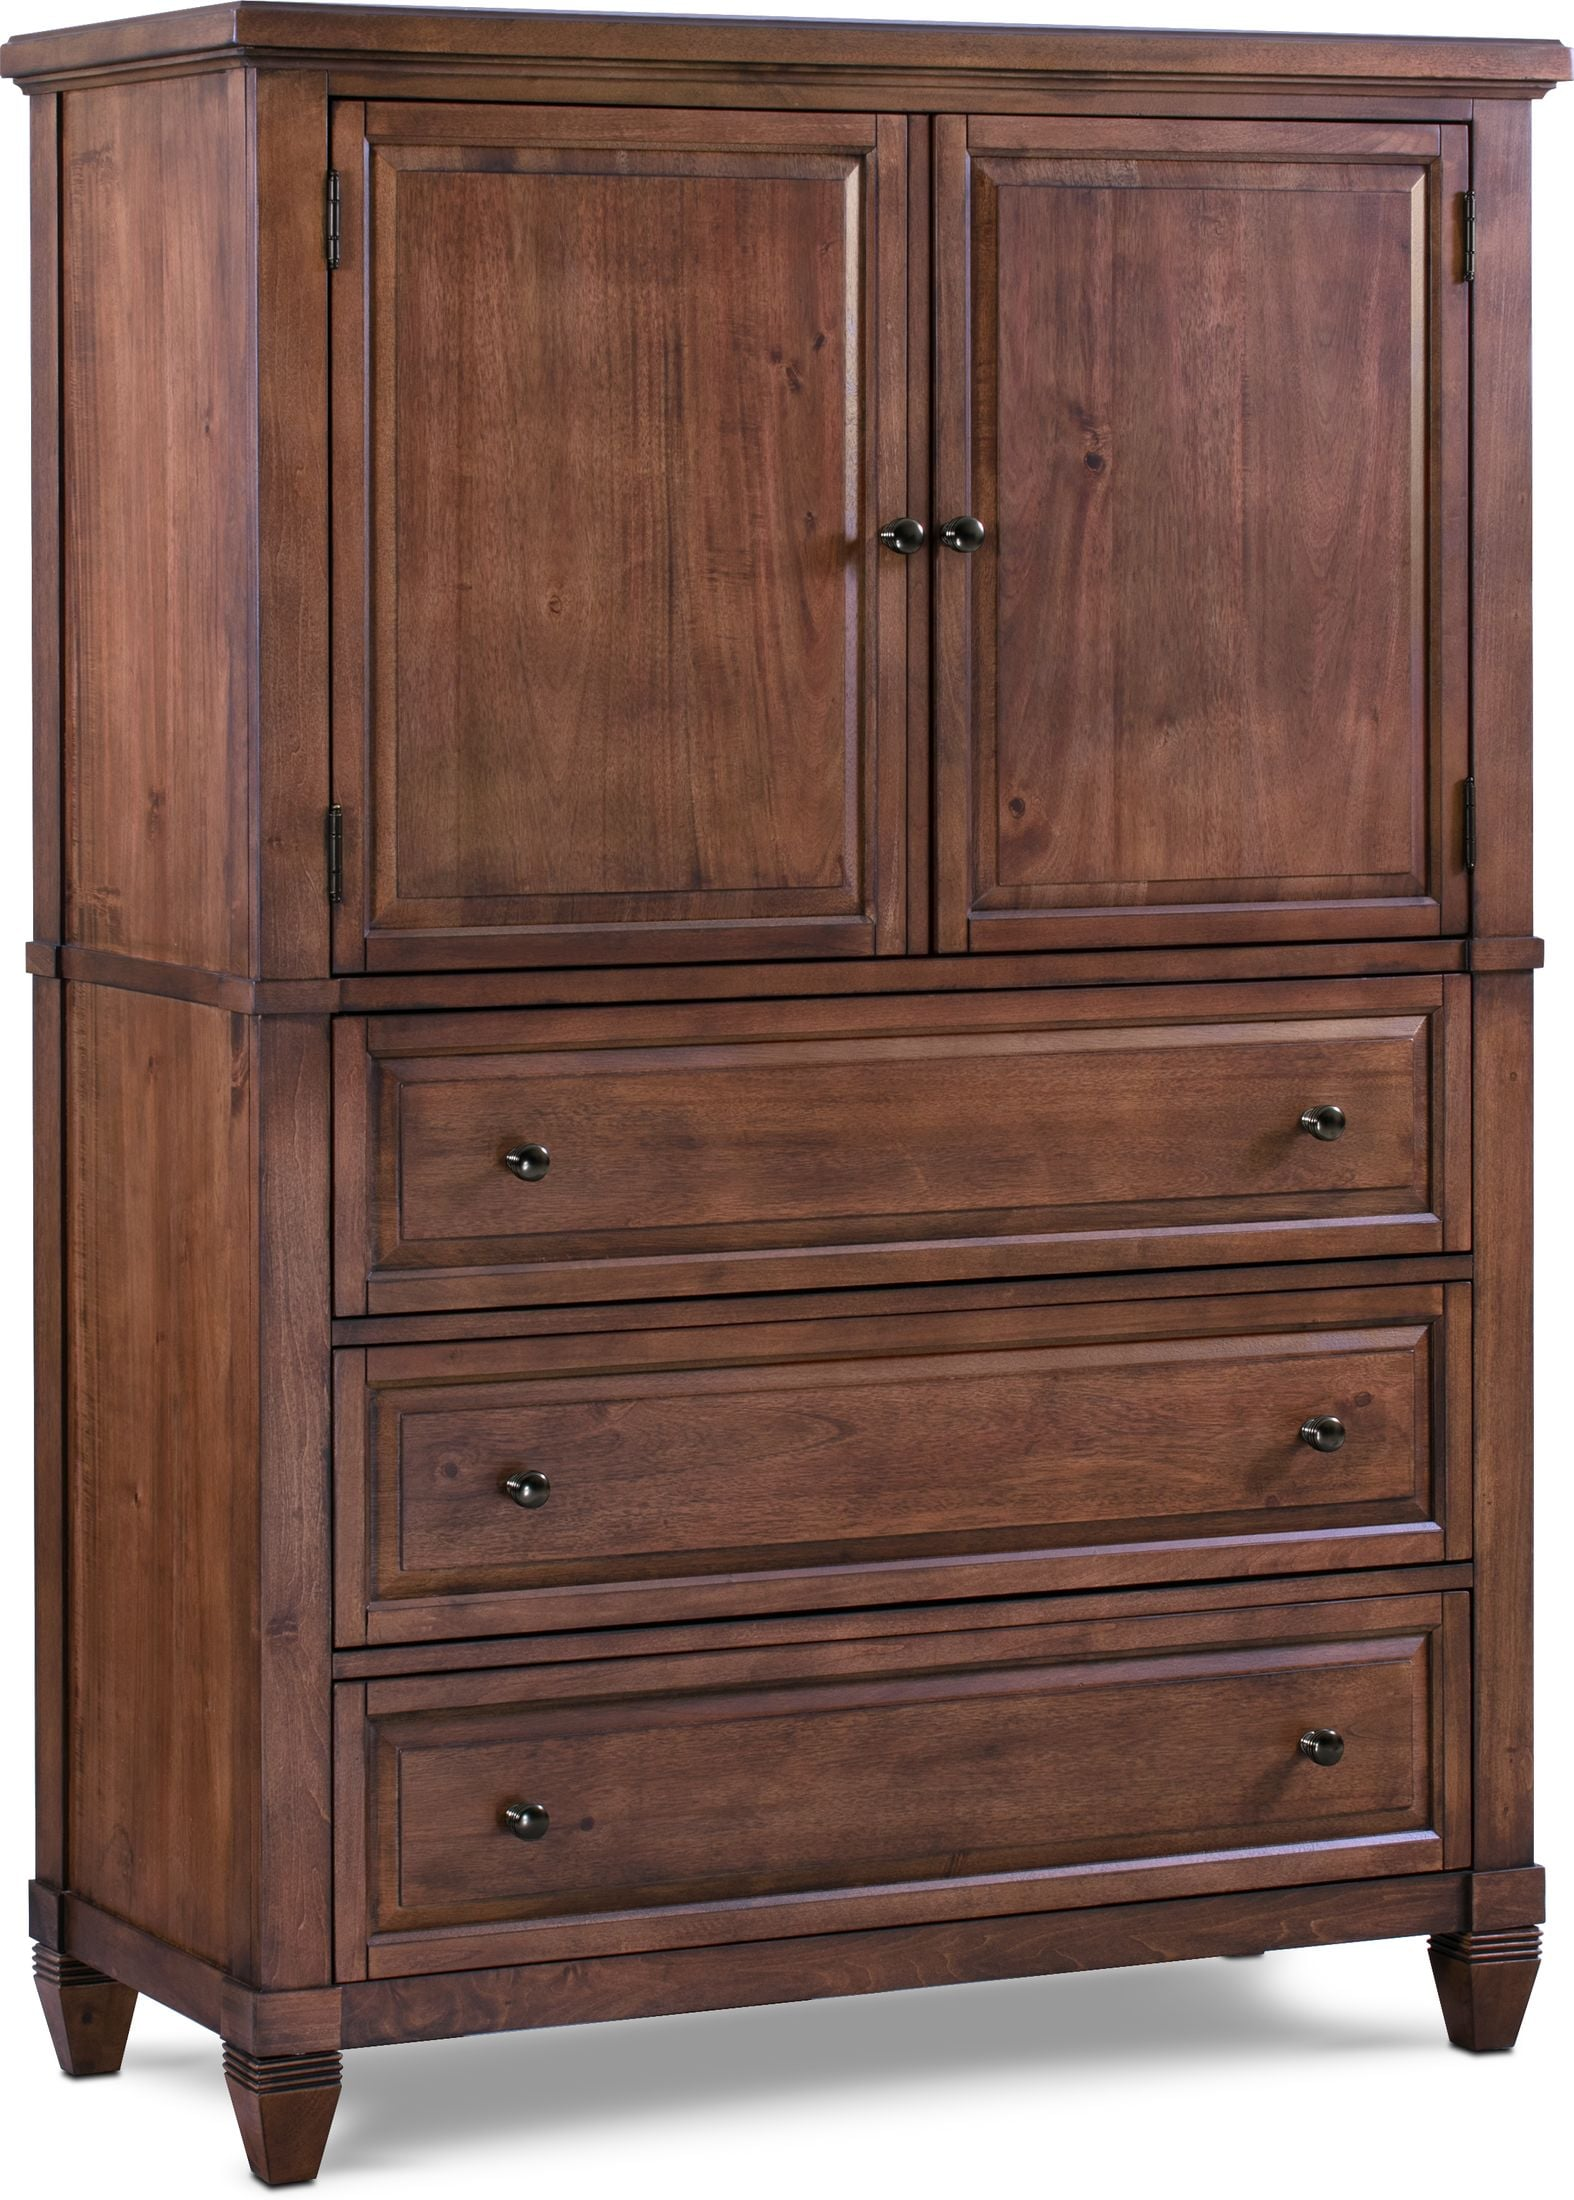 Bedroom Furniture - Rosalie Armoire